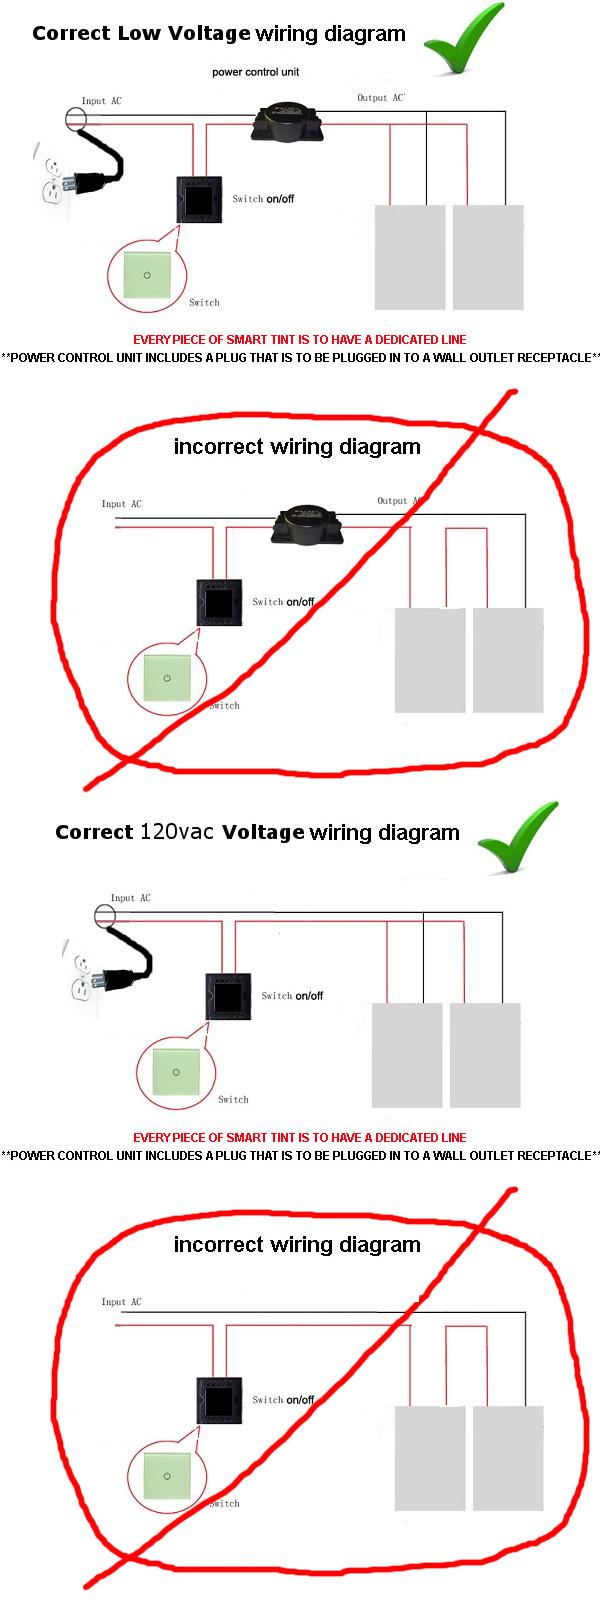 Trane Wiring Diagrams 2307 5588 Bwd Heat Pump Schematic Library Rh 18 Boptions1 De Xe 900 Diagram